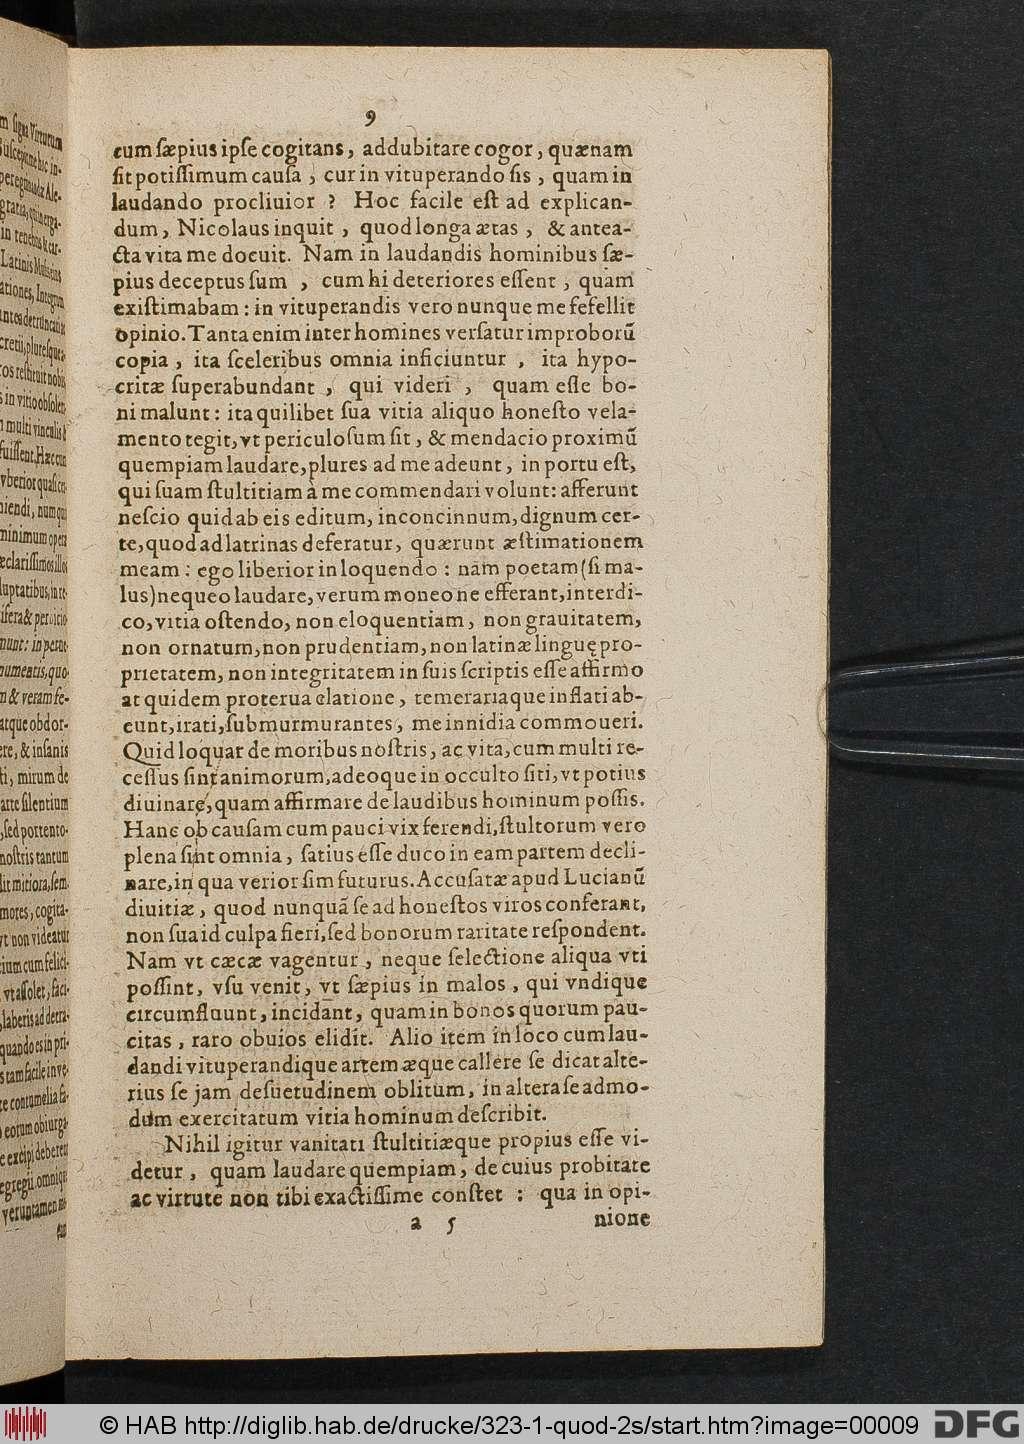 https://diglib.hab.de/drucke/323-1-quod-2s/00009.jpg